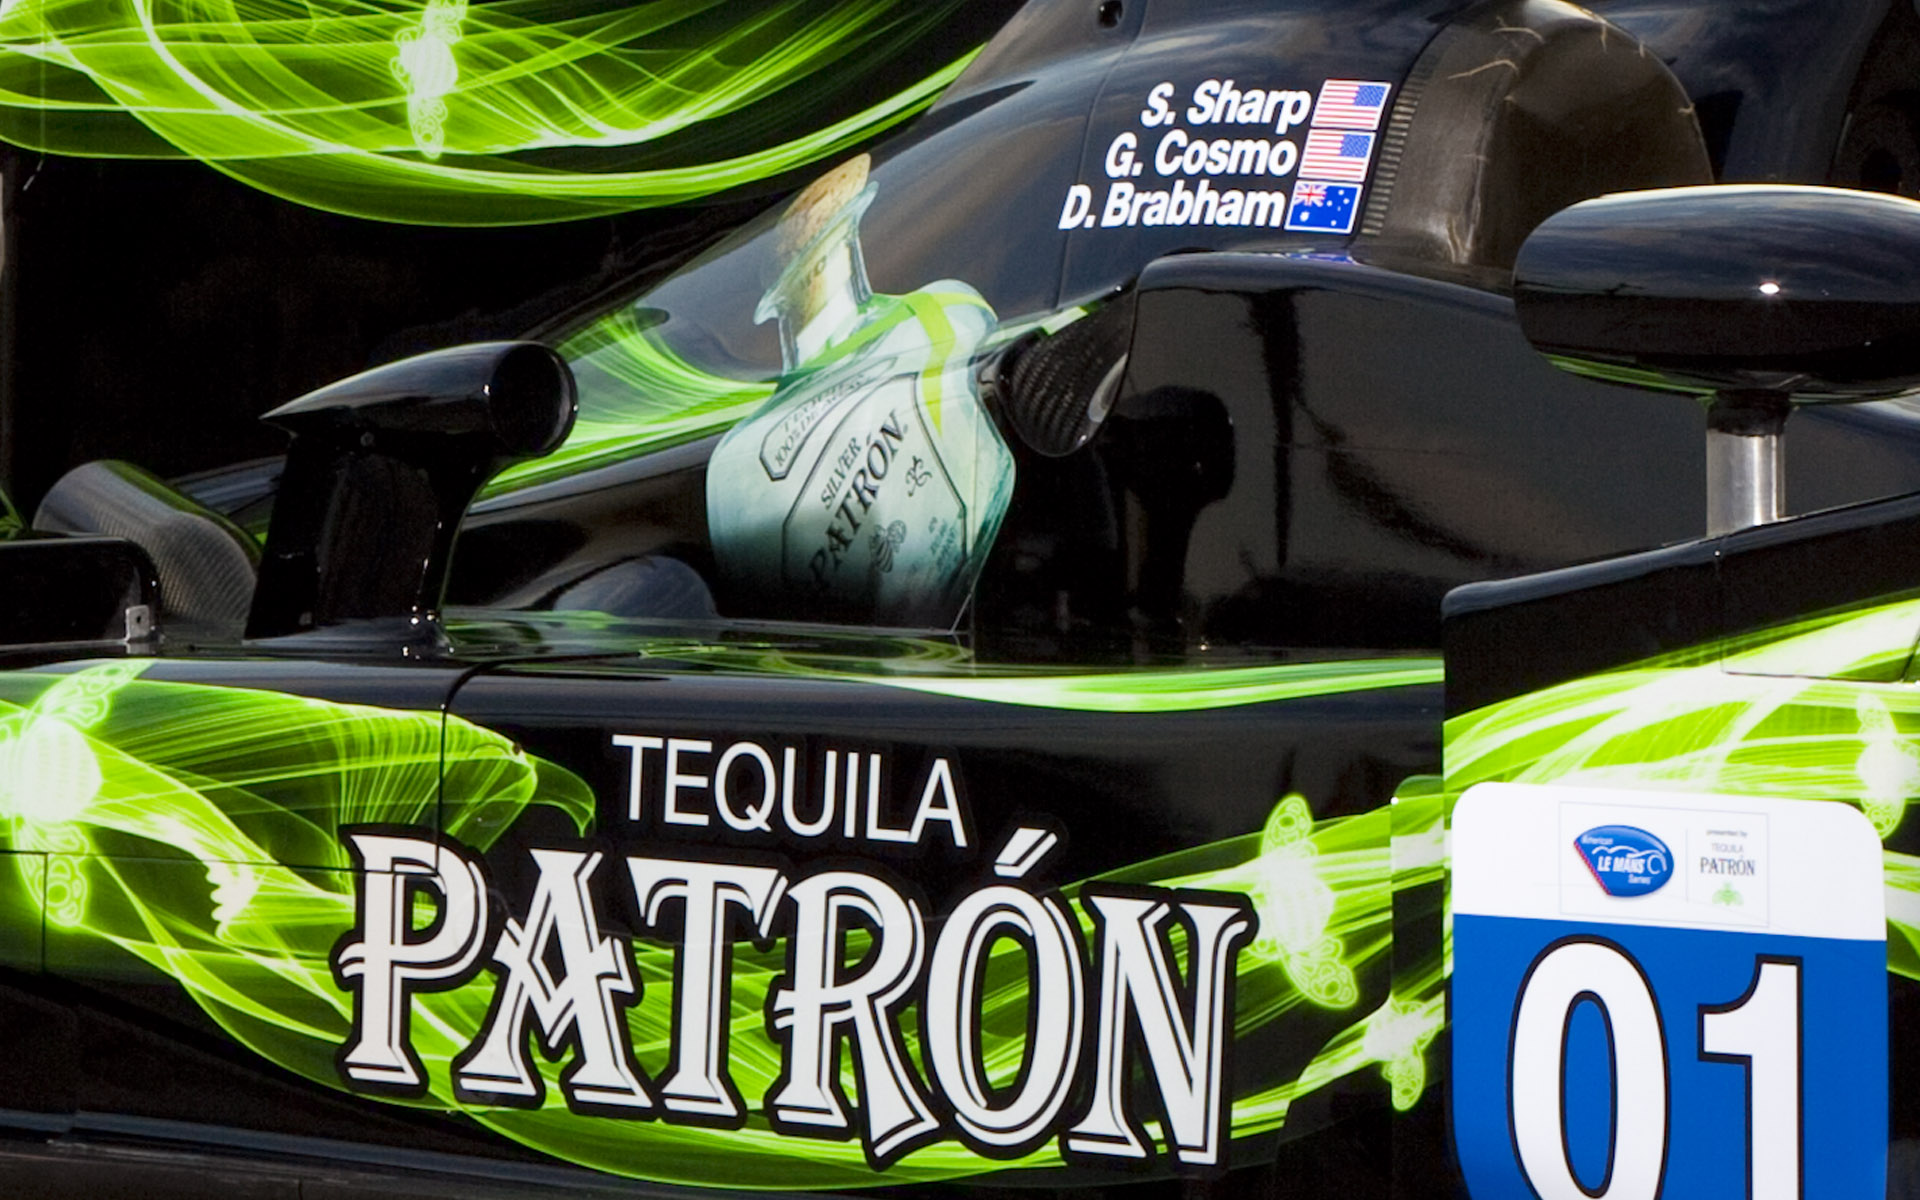 2013 Extreme Speed Motorsports Pátron HPD ARX-03b LMP2 Livery Detail